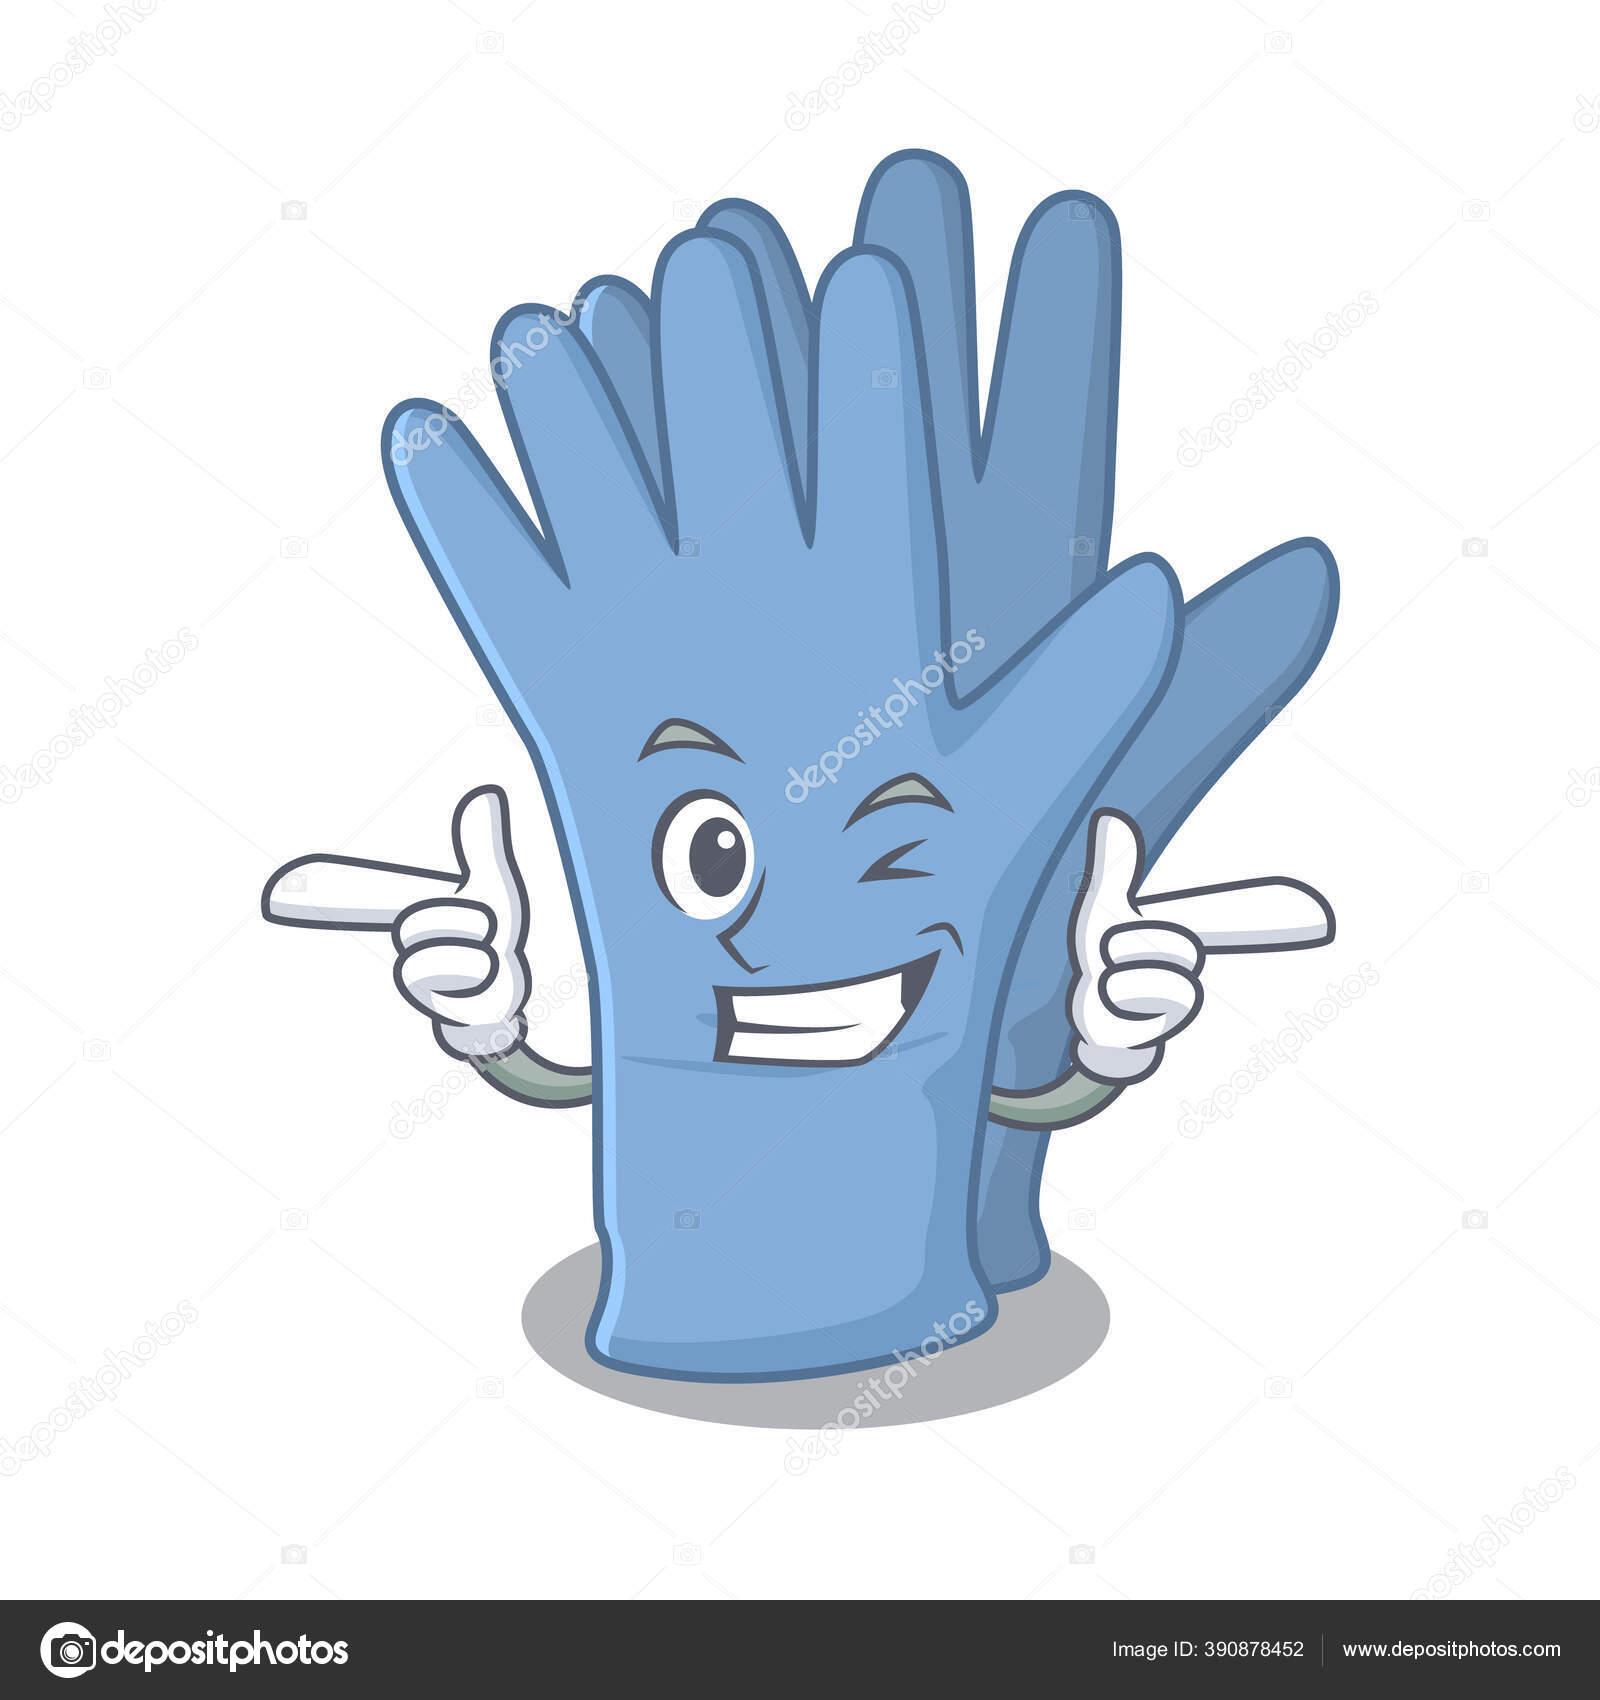 Huge tits hand job